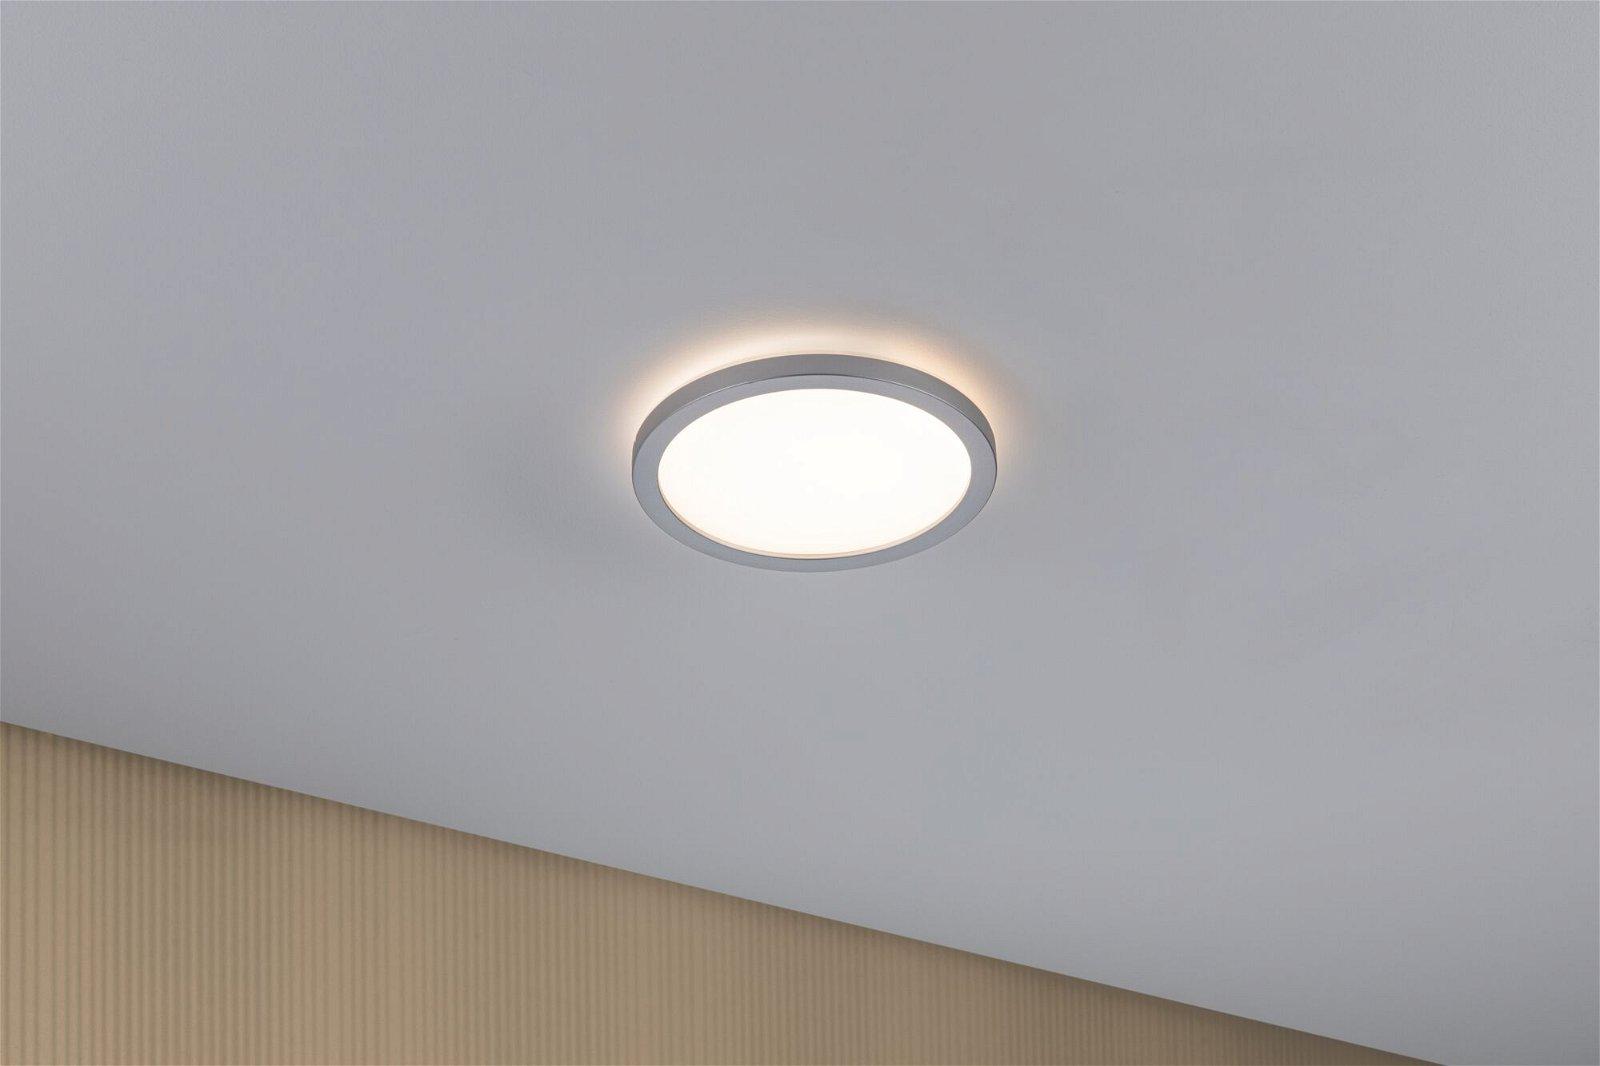 LED Panel Atria Shine rund 190mm 1340lm 3000K Chrom matt